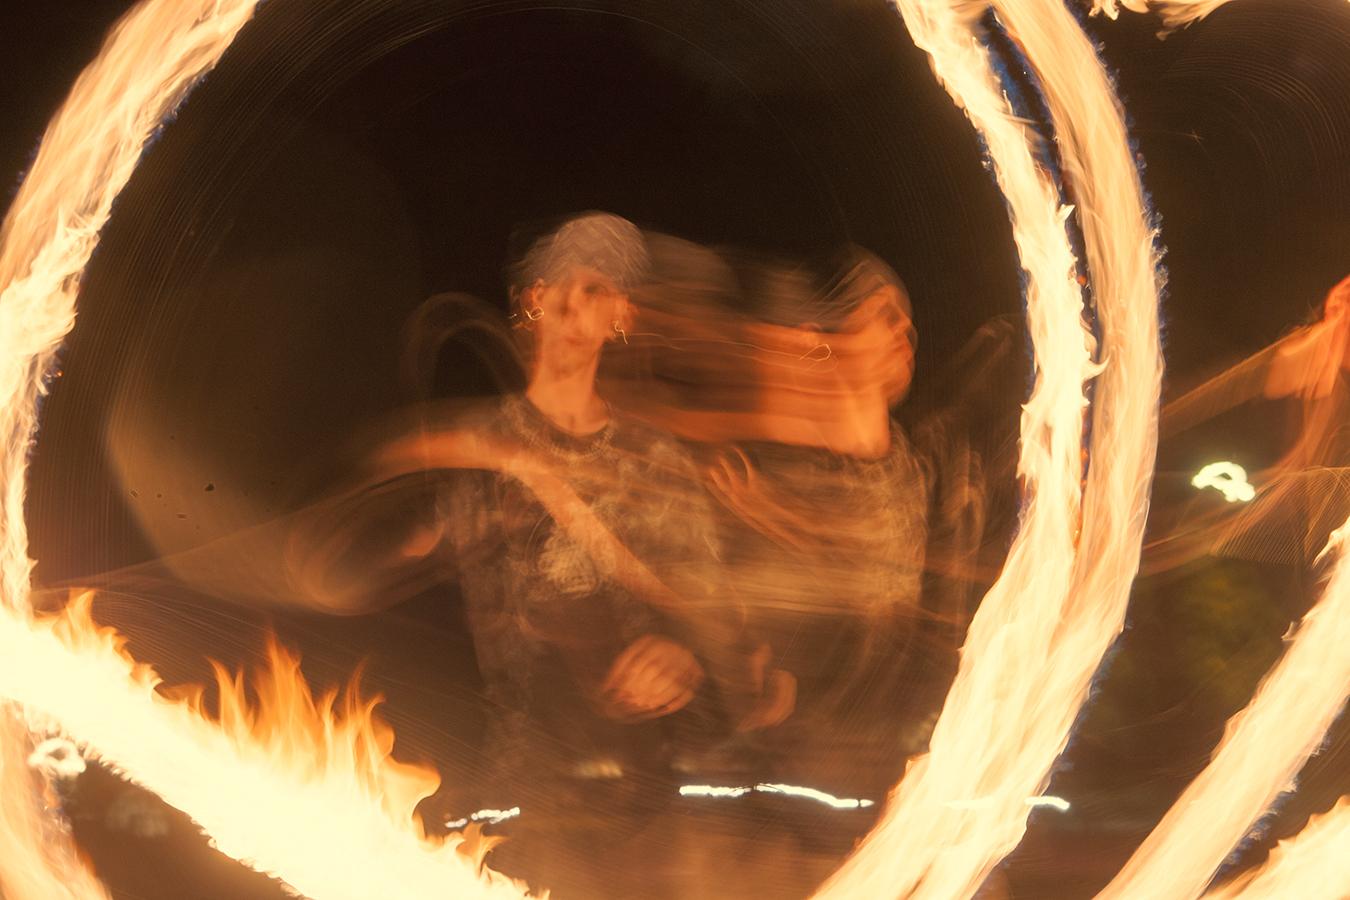 charles i. letbetter - flammable jesus